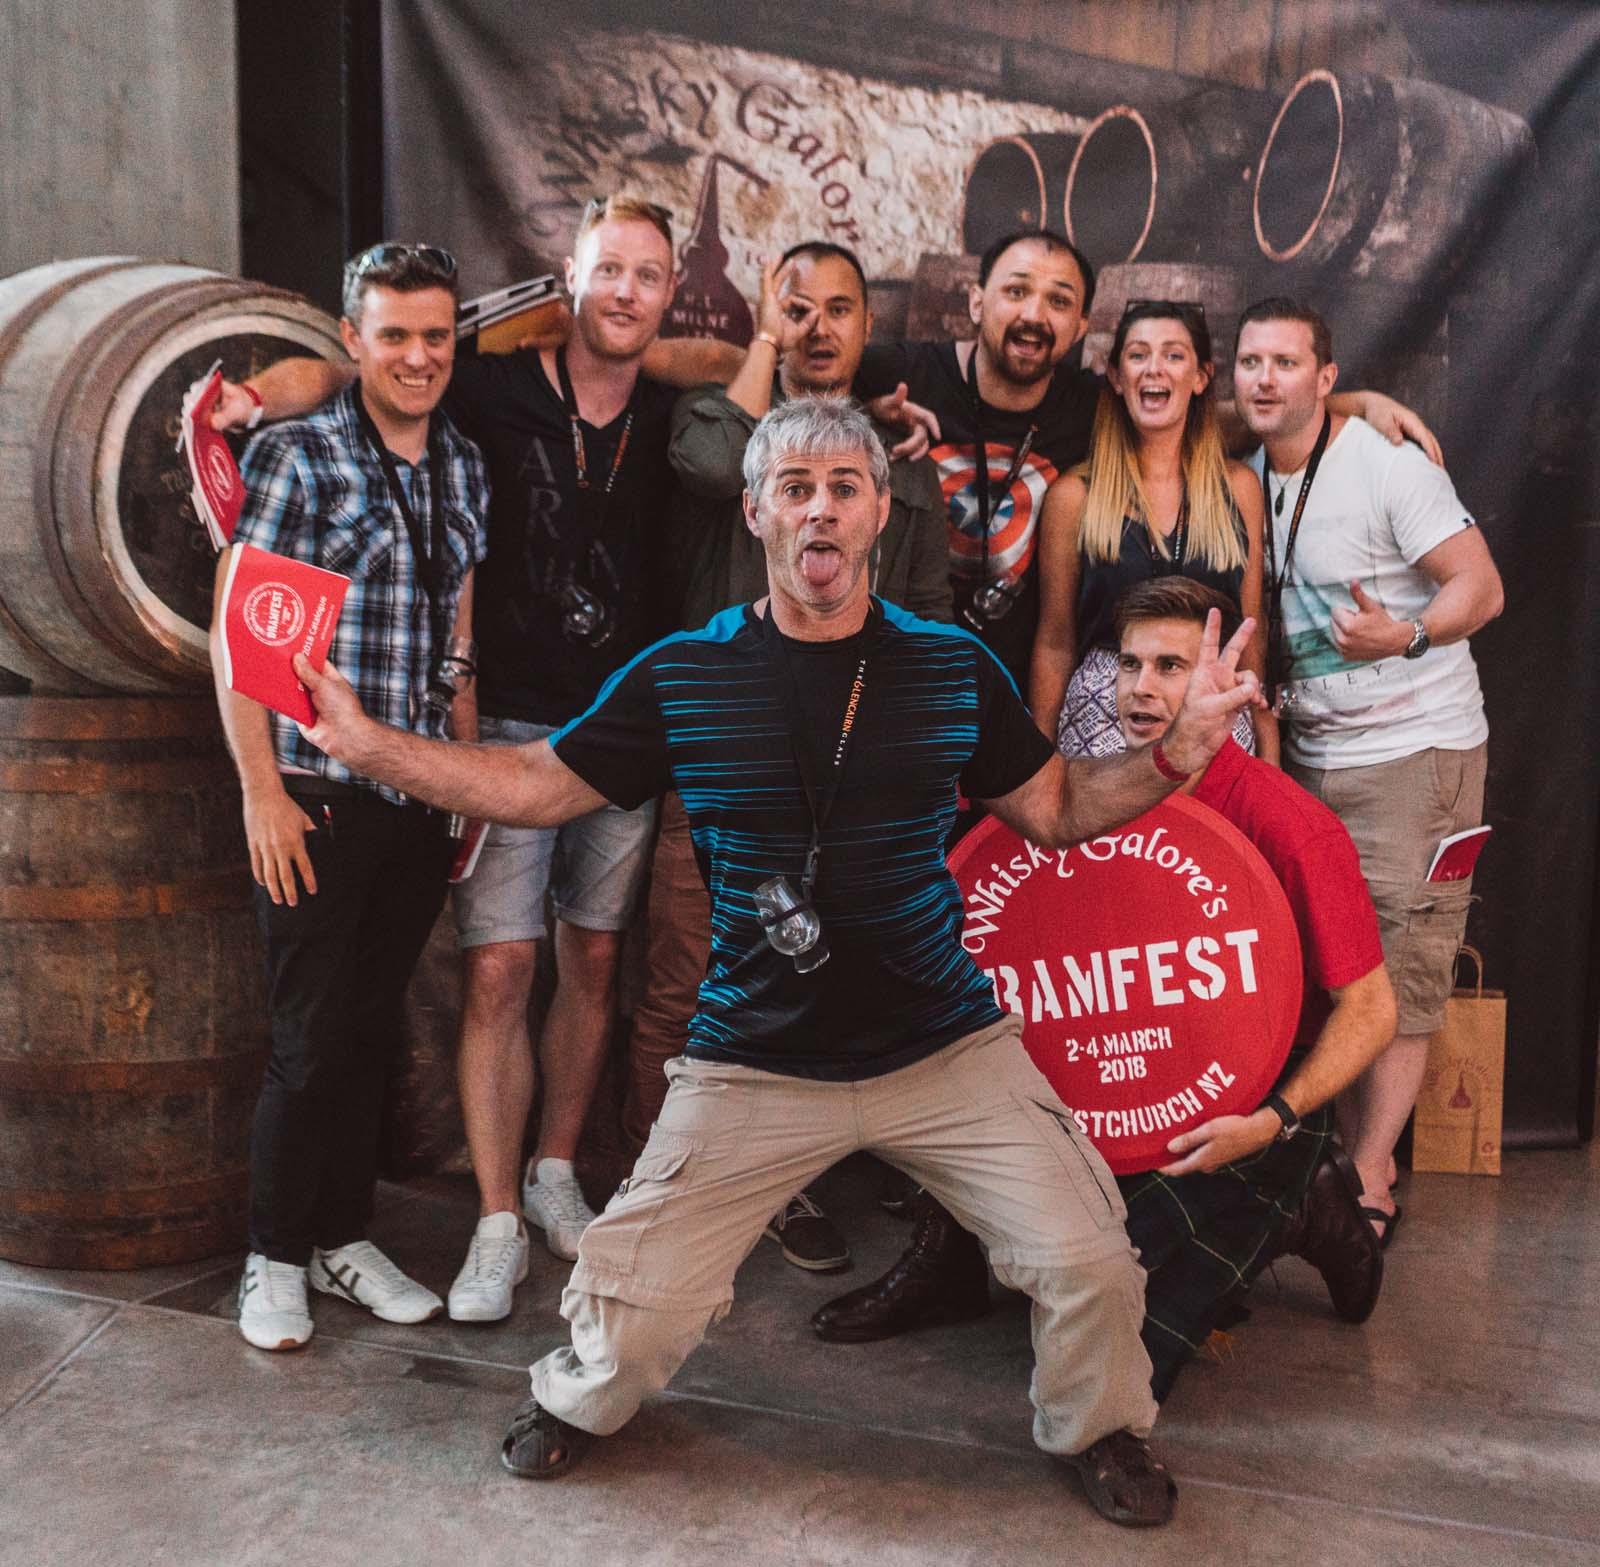 Dramfest 2018 for Whisky Galore-174.jpg